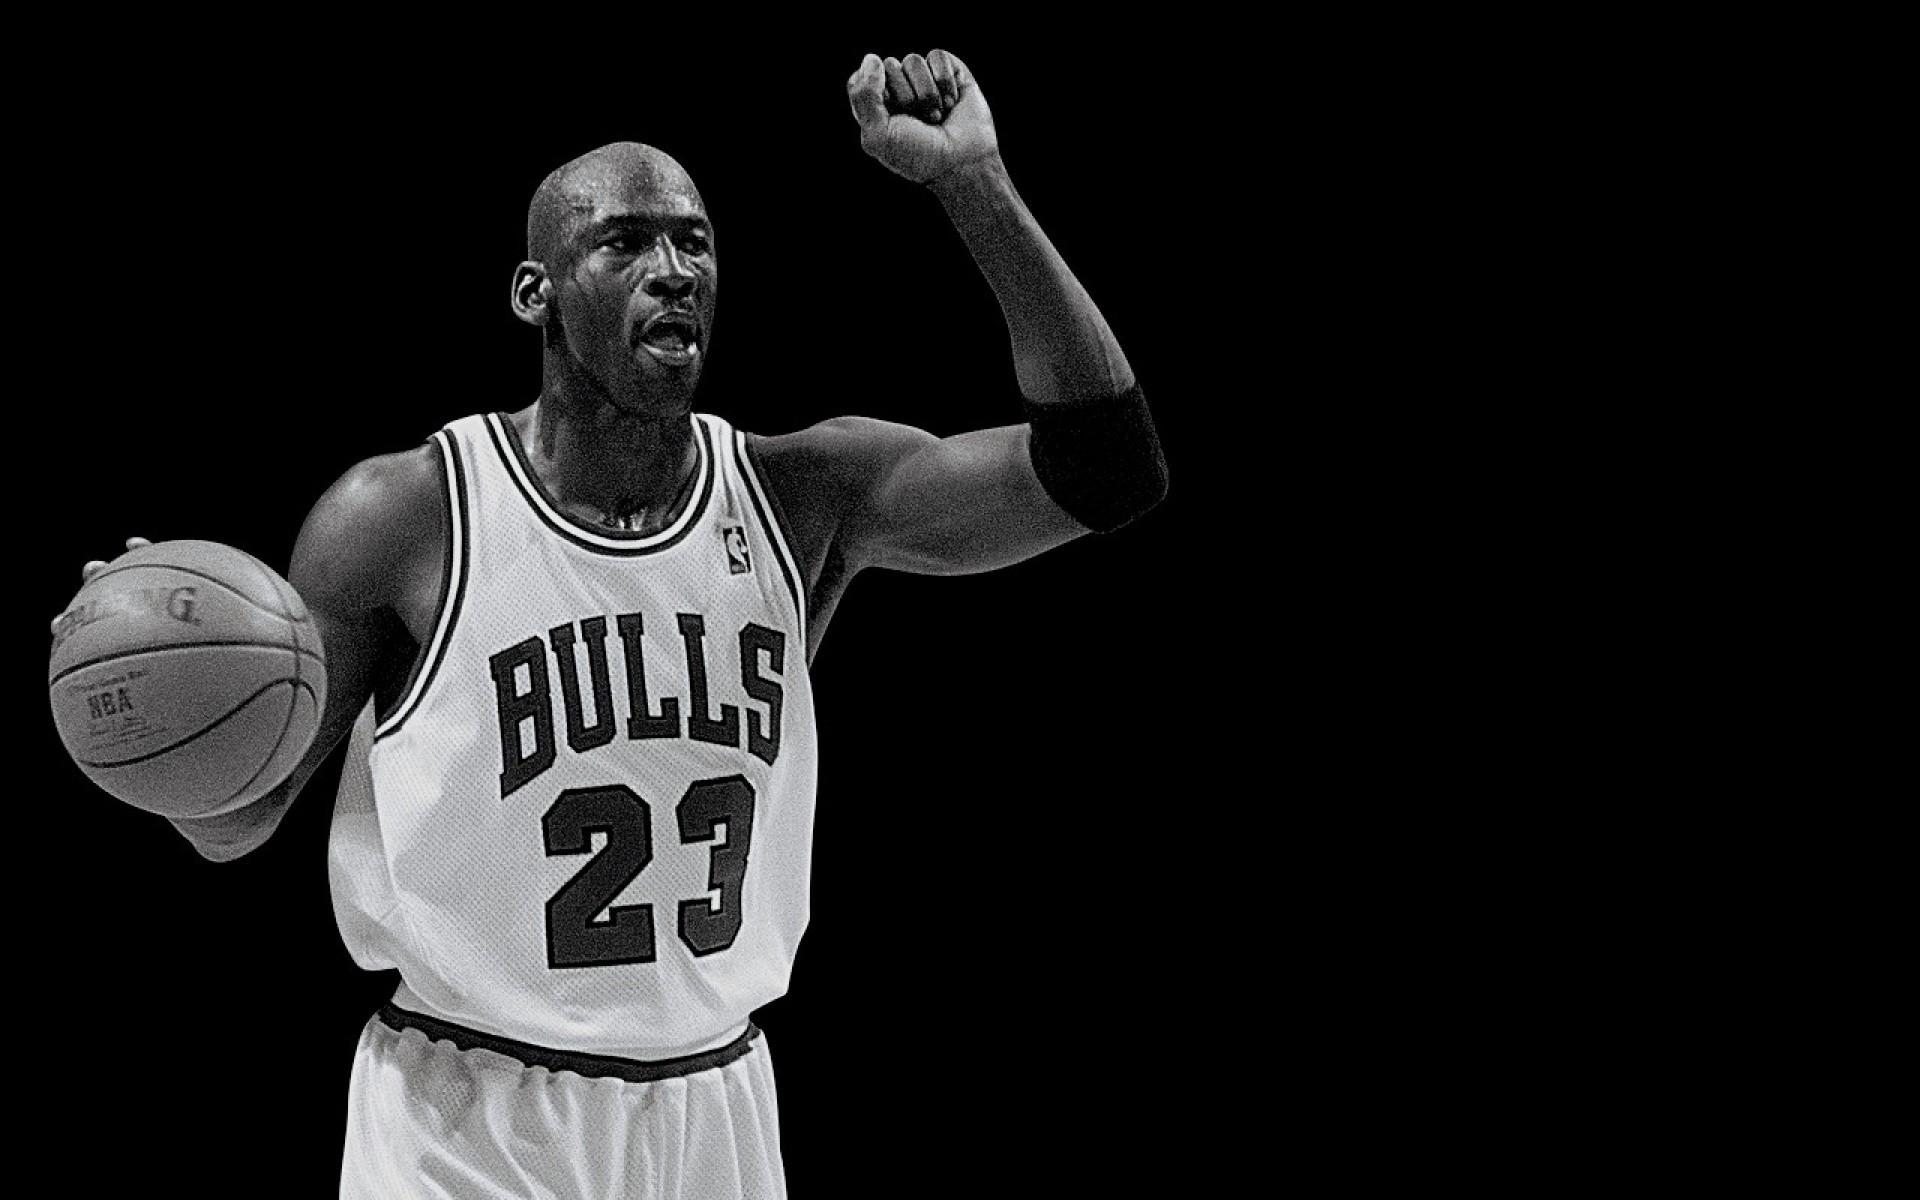 Wallpaper Sports Chicago Bulls Michael Jordan Muscle Arm